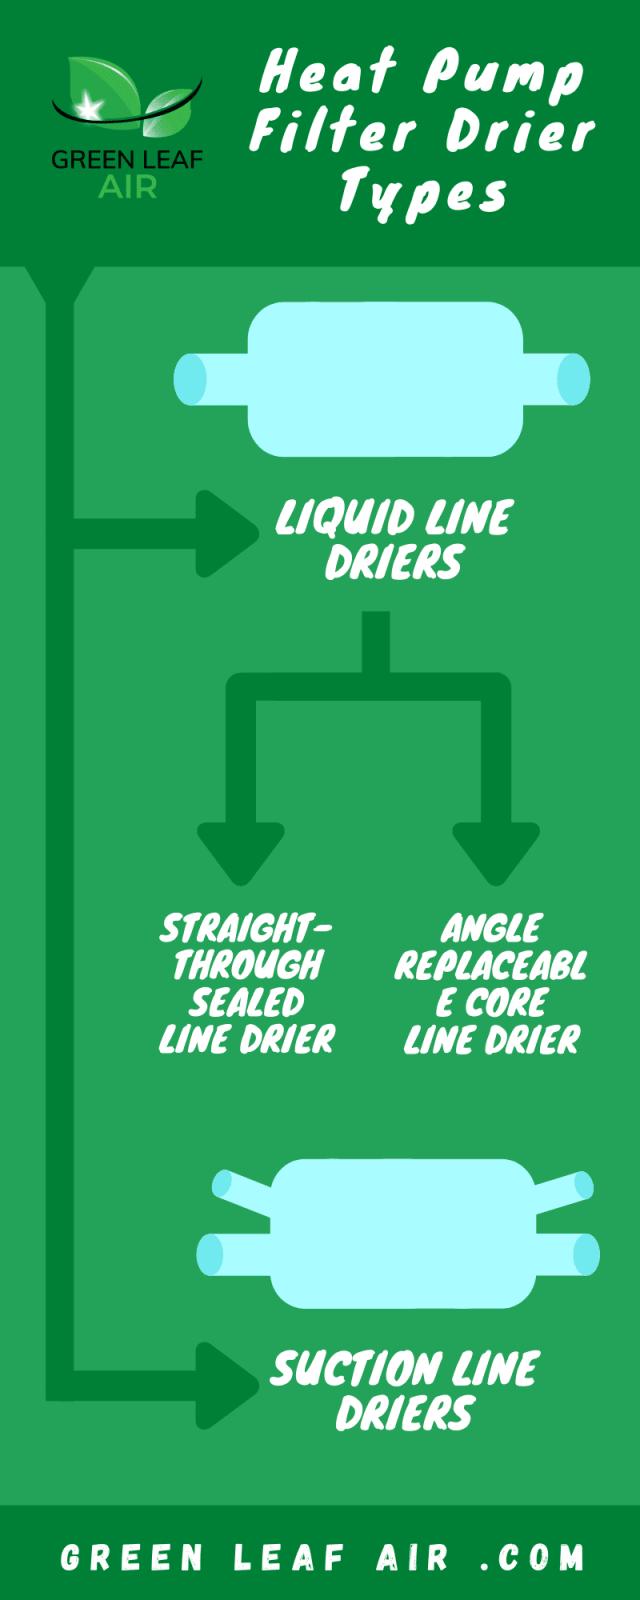 Heat Pump Filter Drier Types